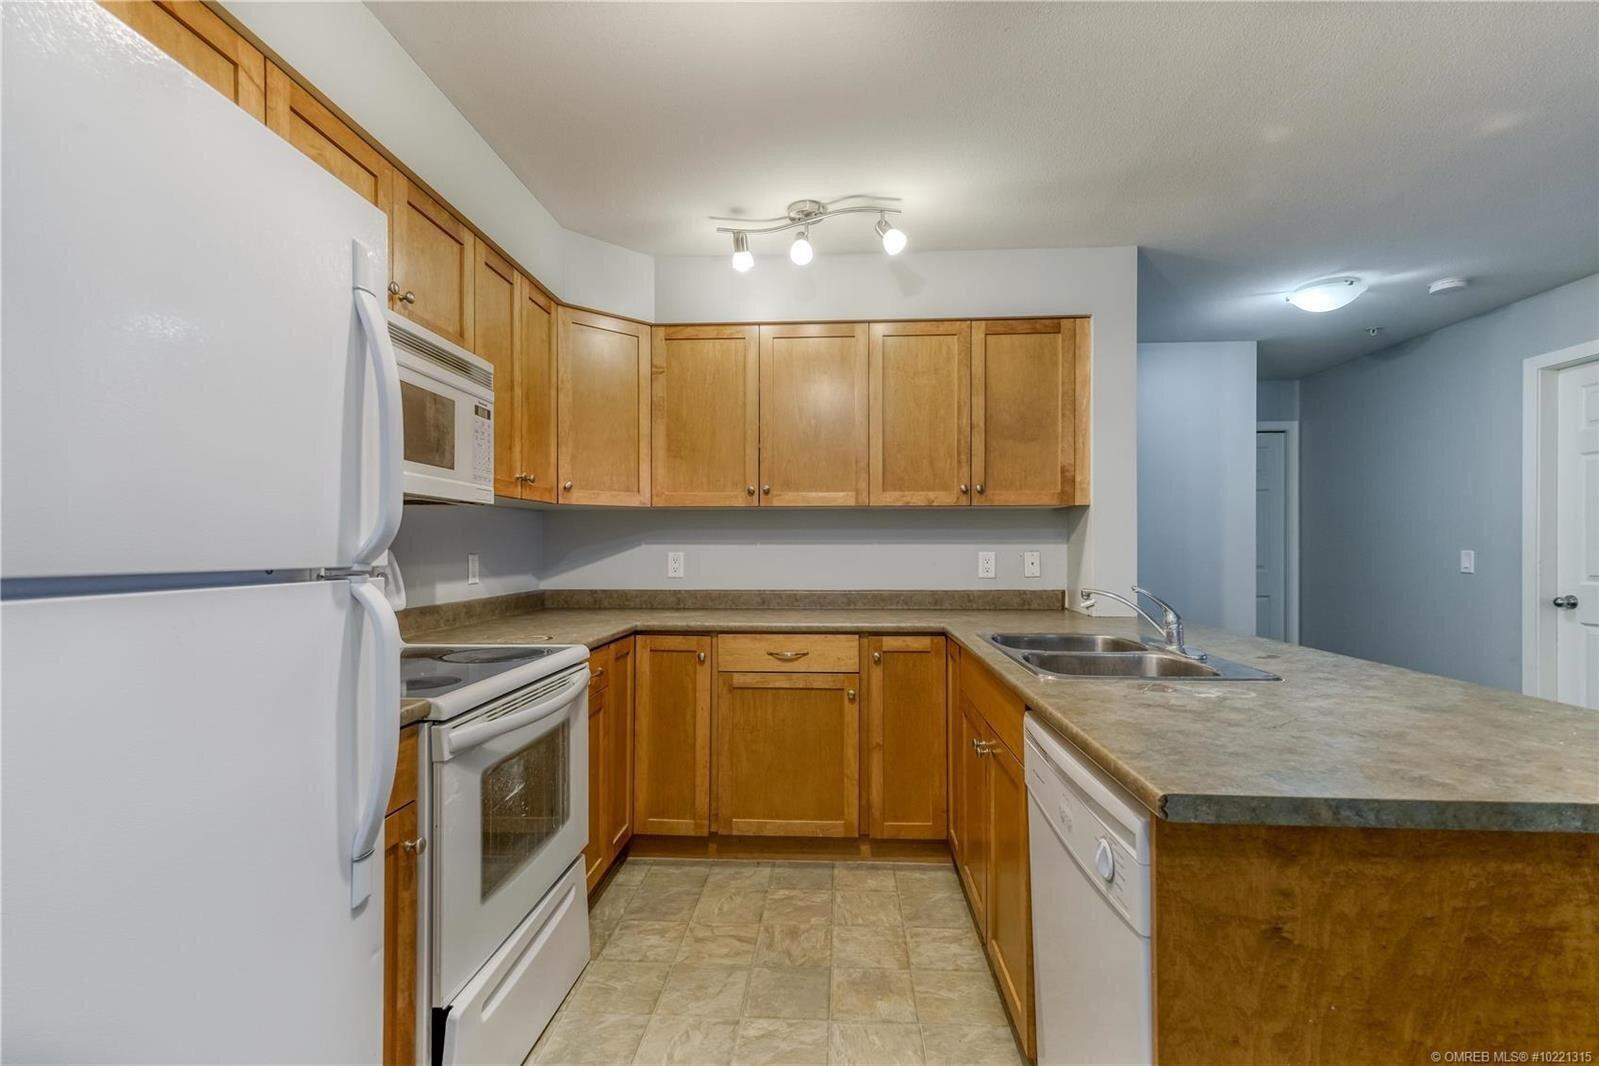 Condo for sale at 135 Ziprick Rd Unit 205 Kelowna British Columbia - MLS: 10221315